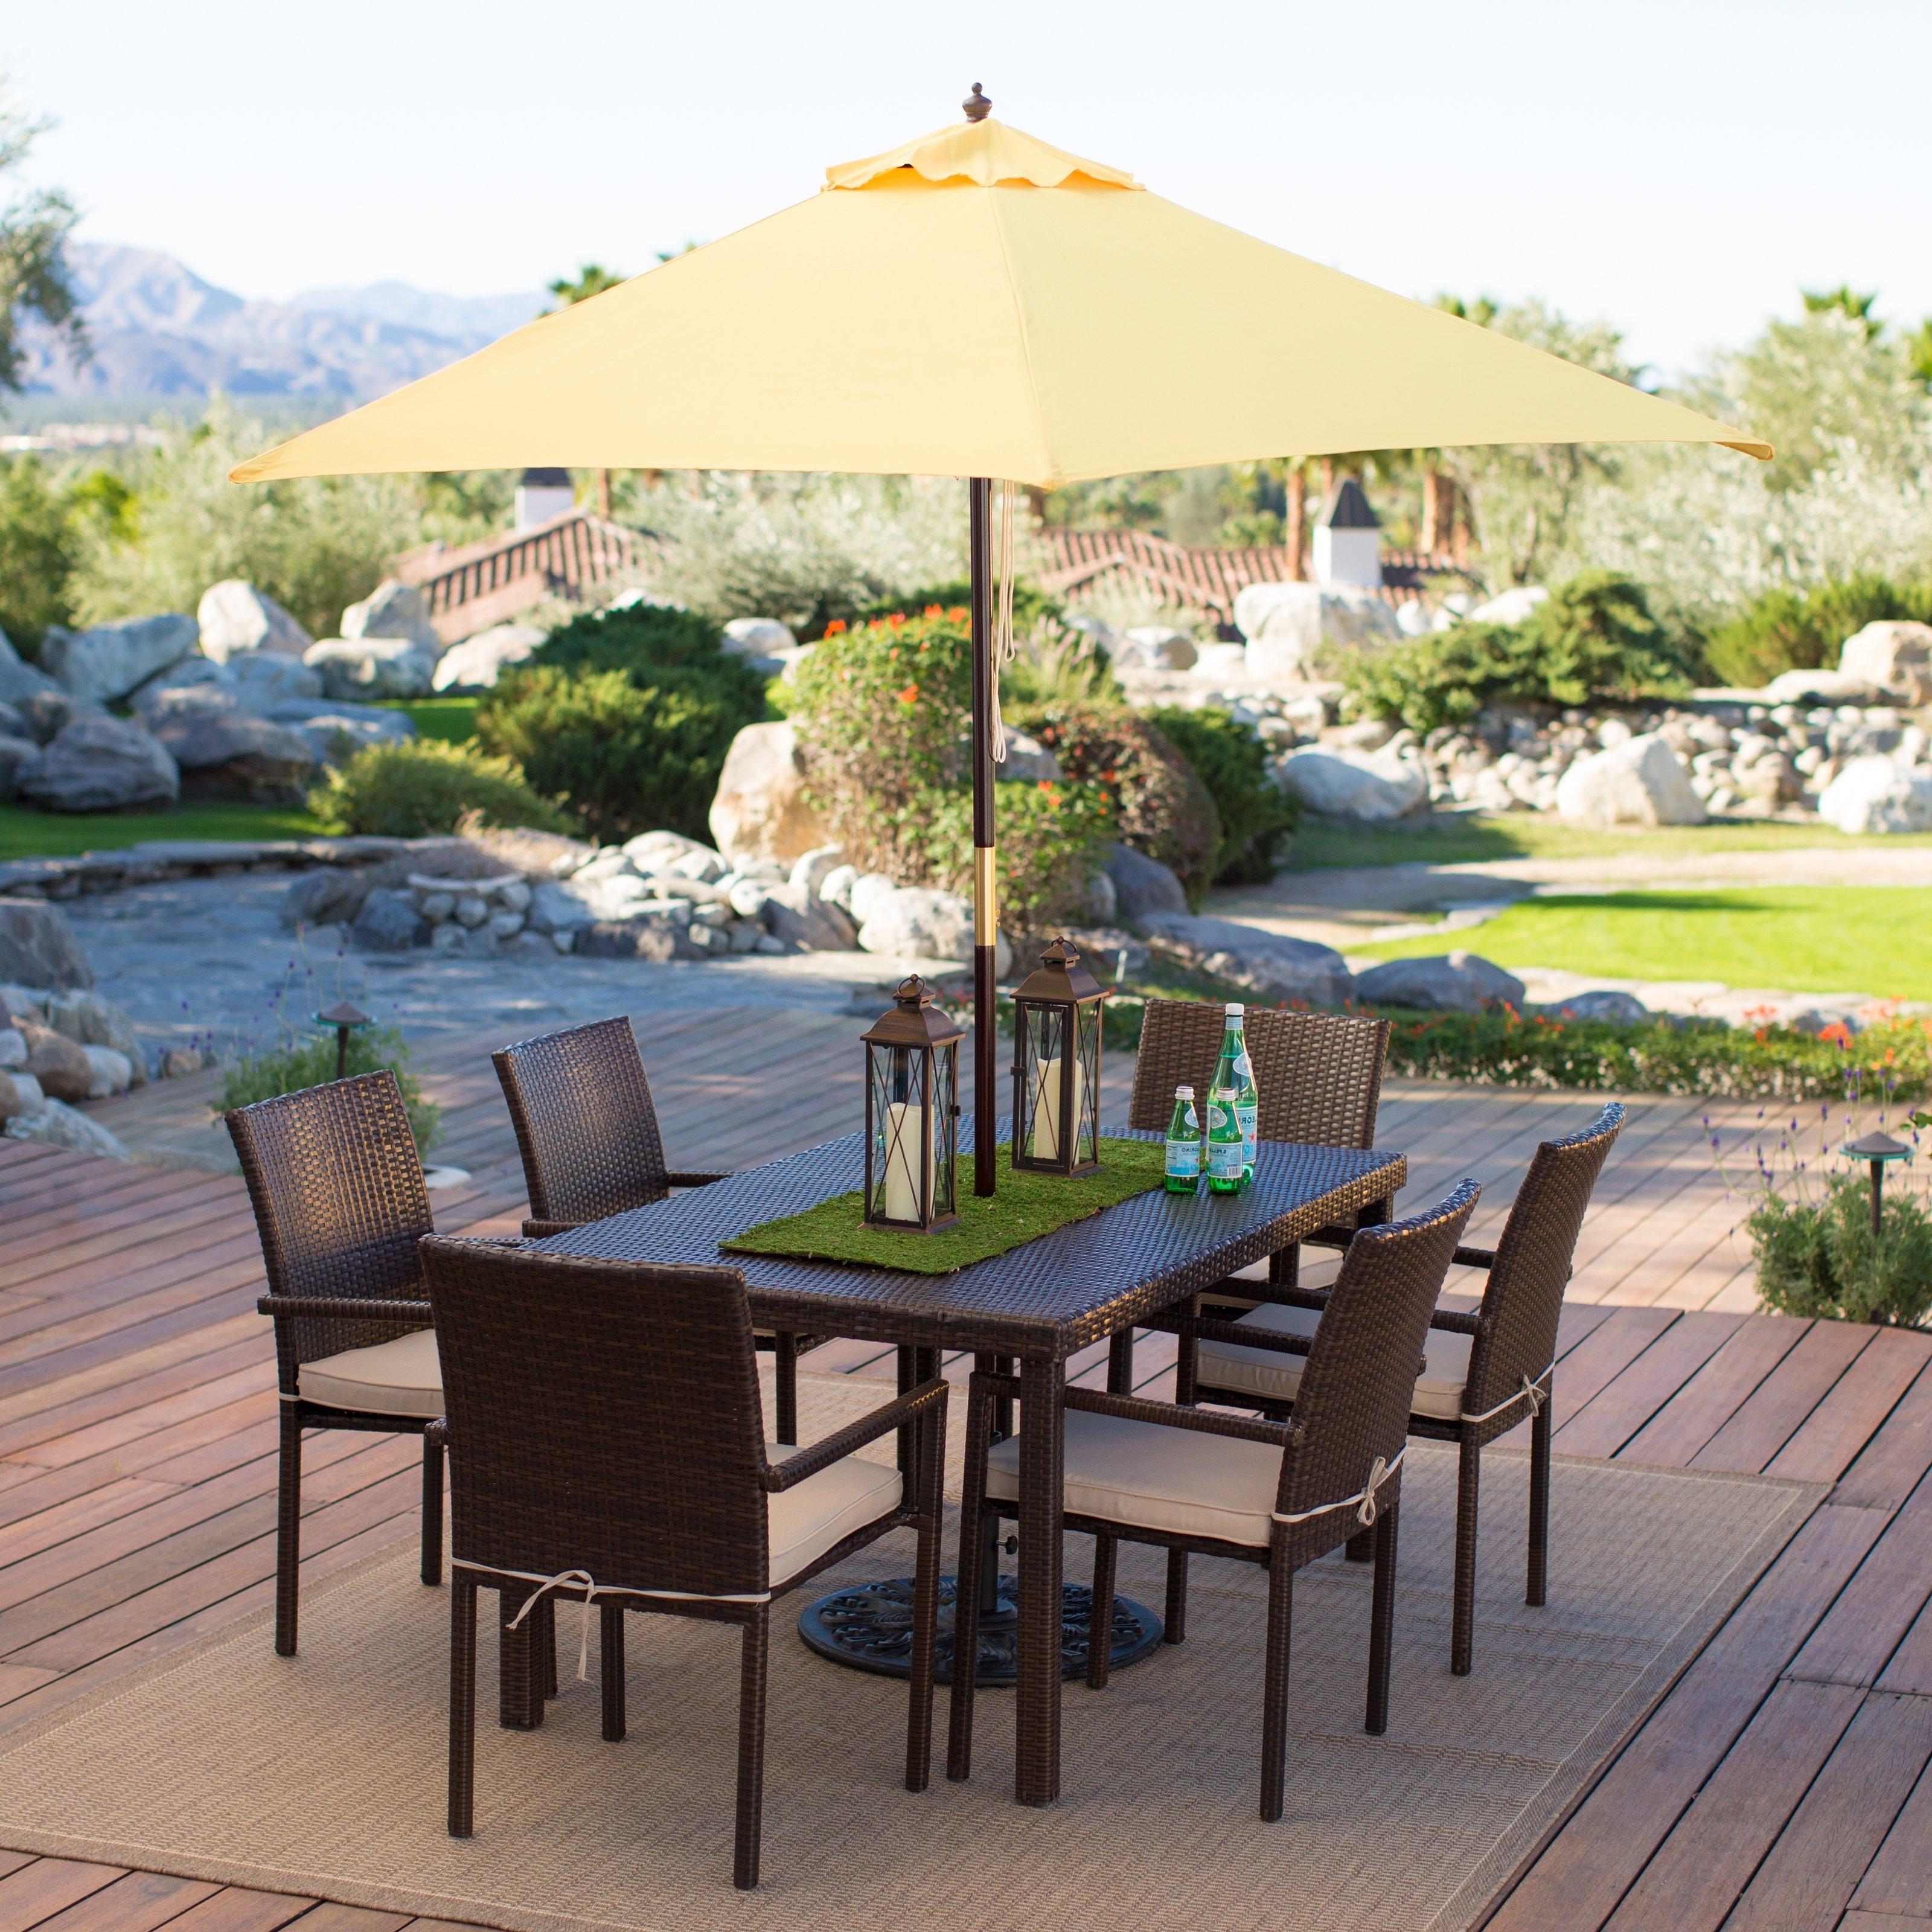 Outdoor Umbrella For Sale Outdoor Umbrella For Sale Cape Town Umbrellas With Most Current Gold Coast Patio Umbrellas (View 15 of 20)